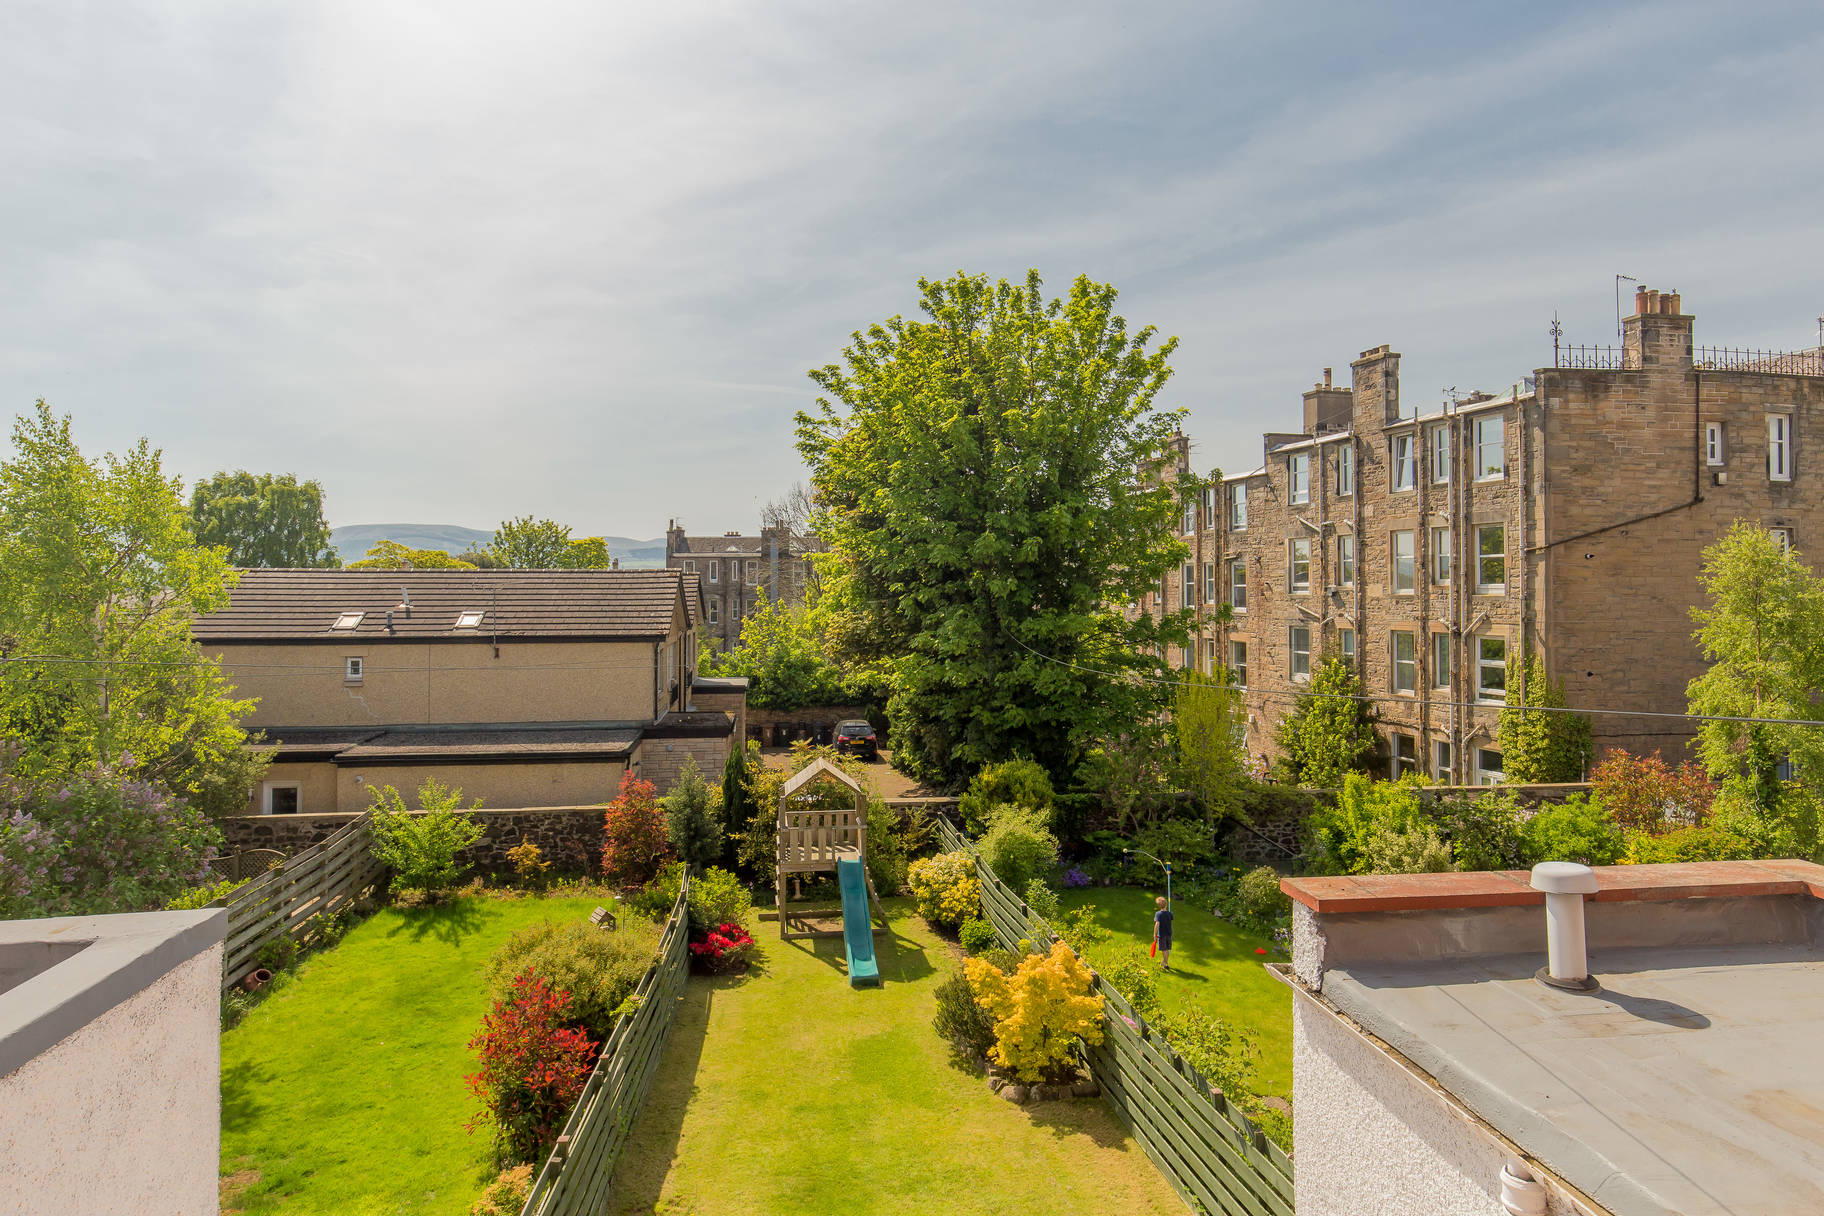 79 Belgrave Road, Corstorphine, Edinburgh, EH12 6NH